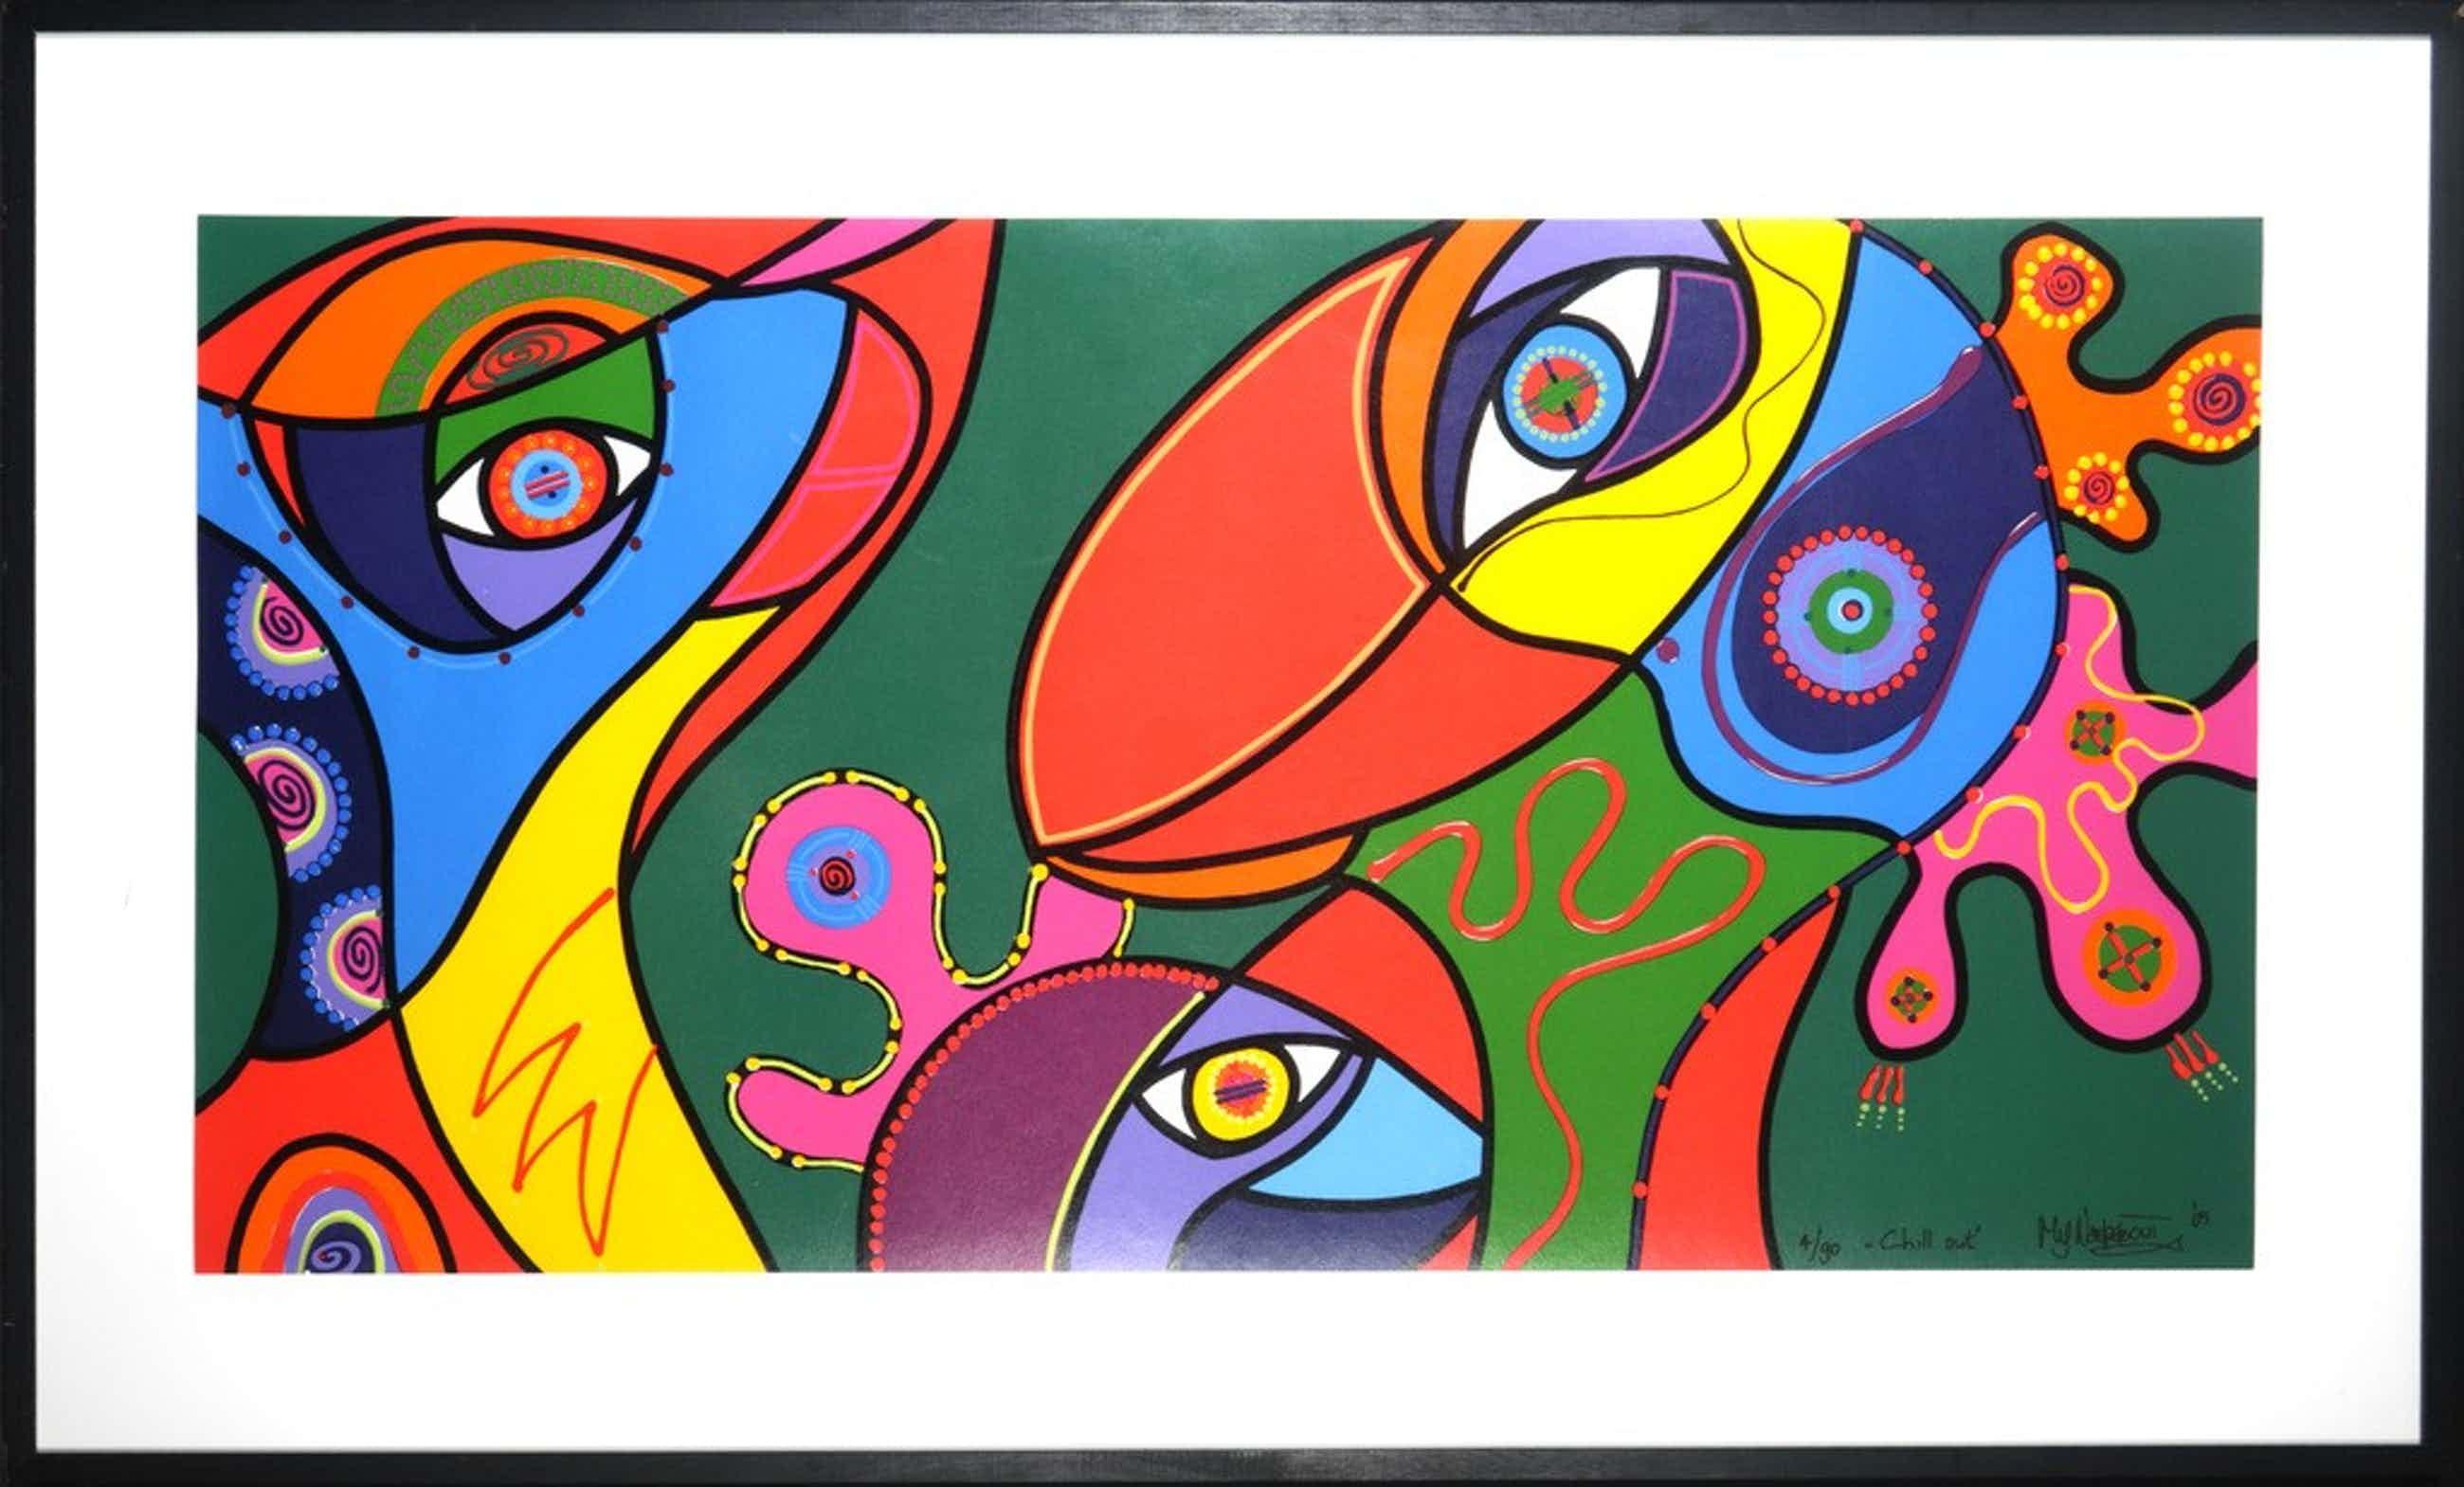 Marianne Naerebout - Kleurenzeefdruk CHILL OUT INGELIJST(groot)!! kopen? Bied vanaf 325!